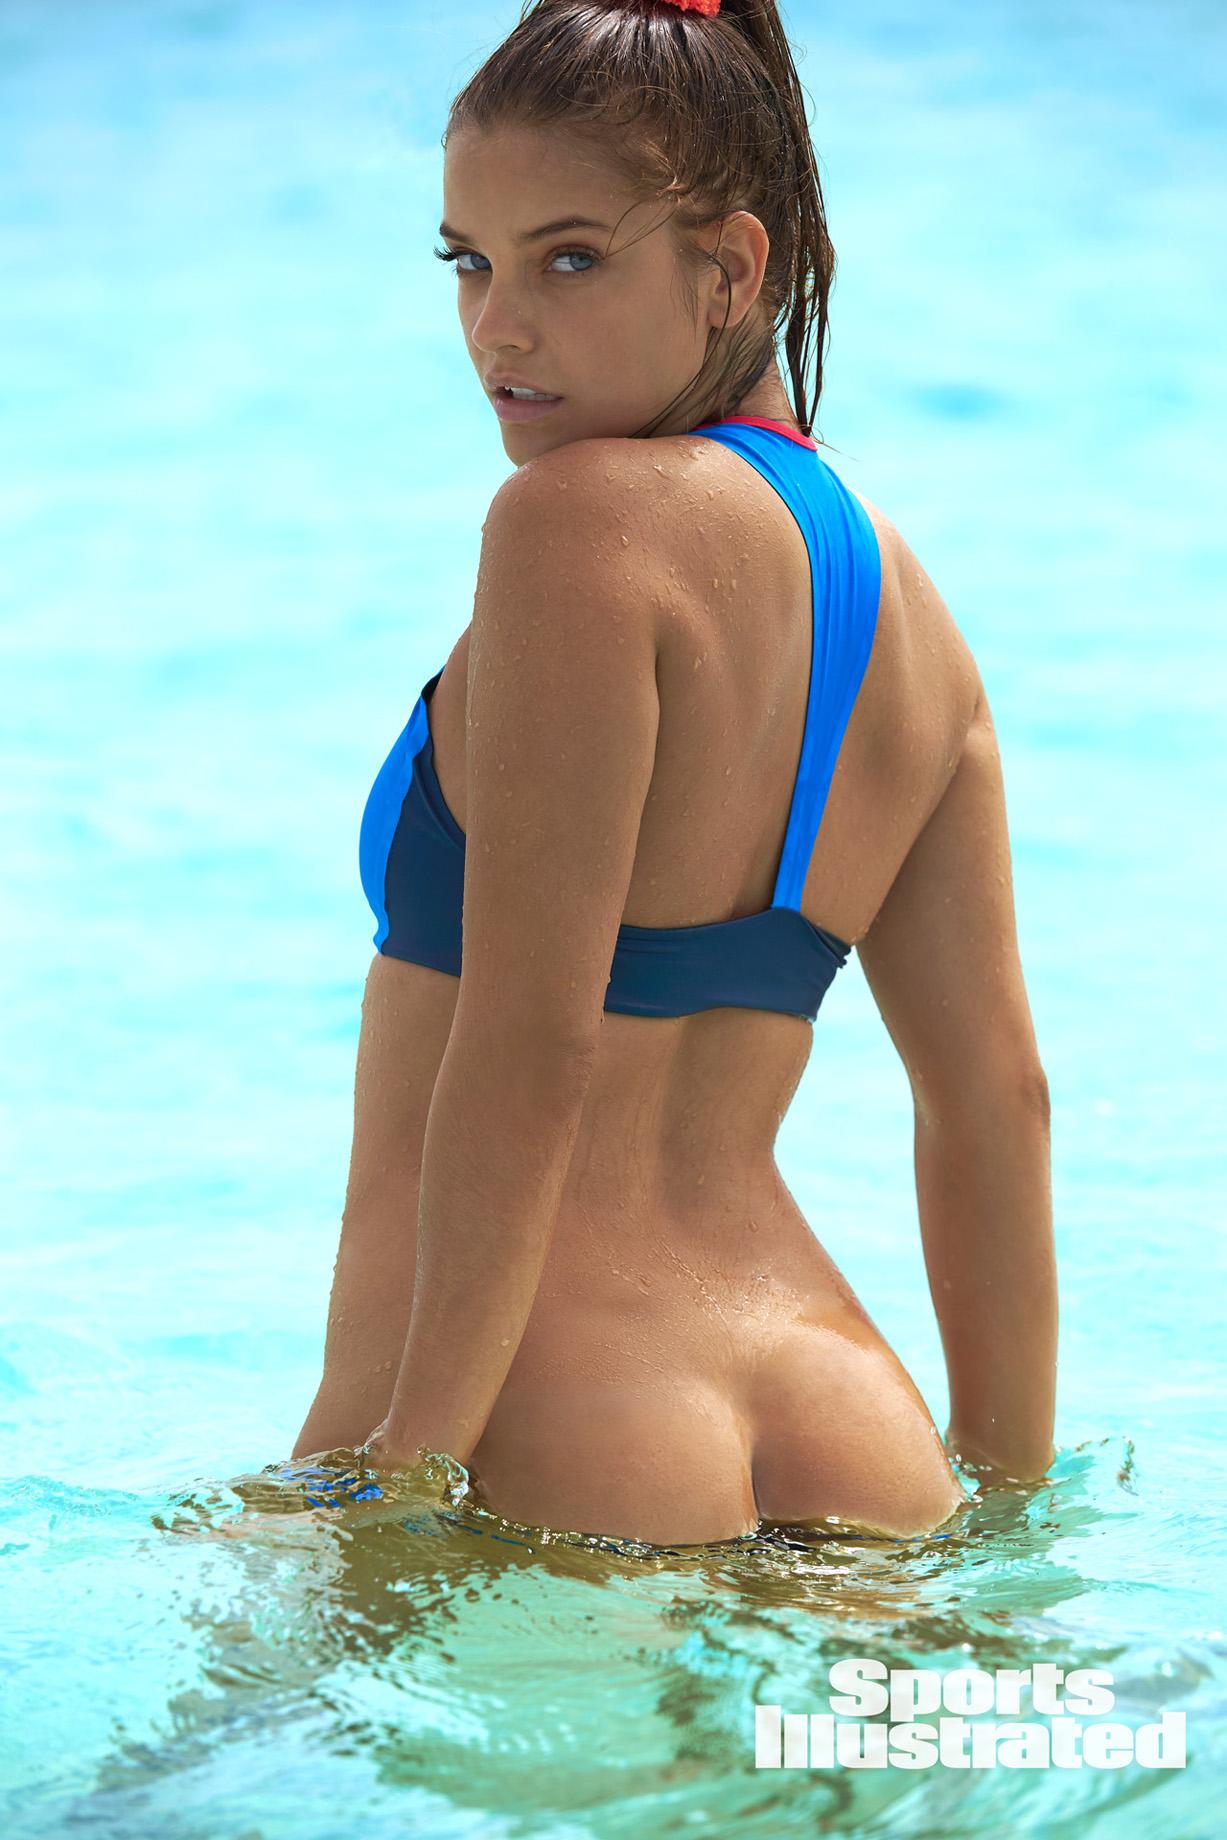 Barbara Palvin / Барбара Палвин в купальниках из новой коллекции Sports Illustrated Swimsuit 2018 issue / in the Bahamas by Ben Watts